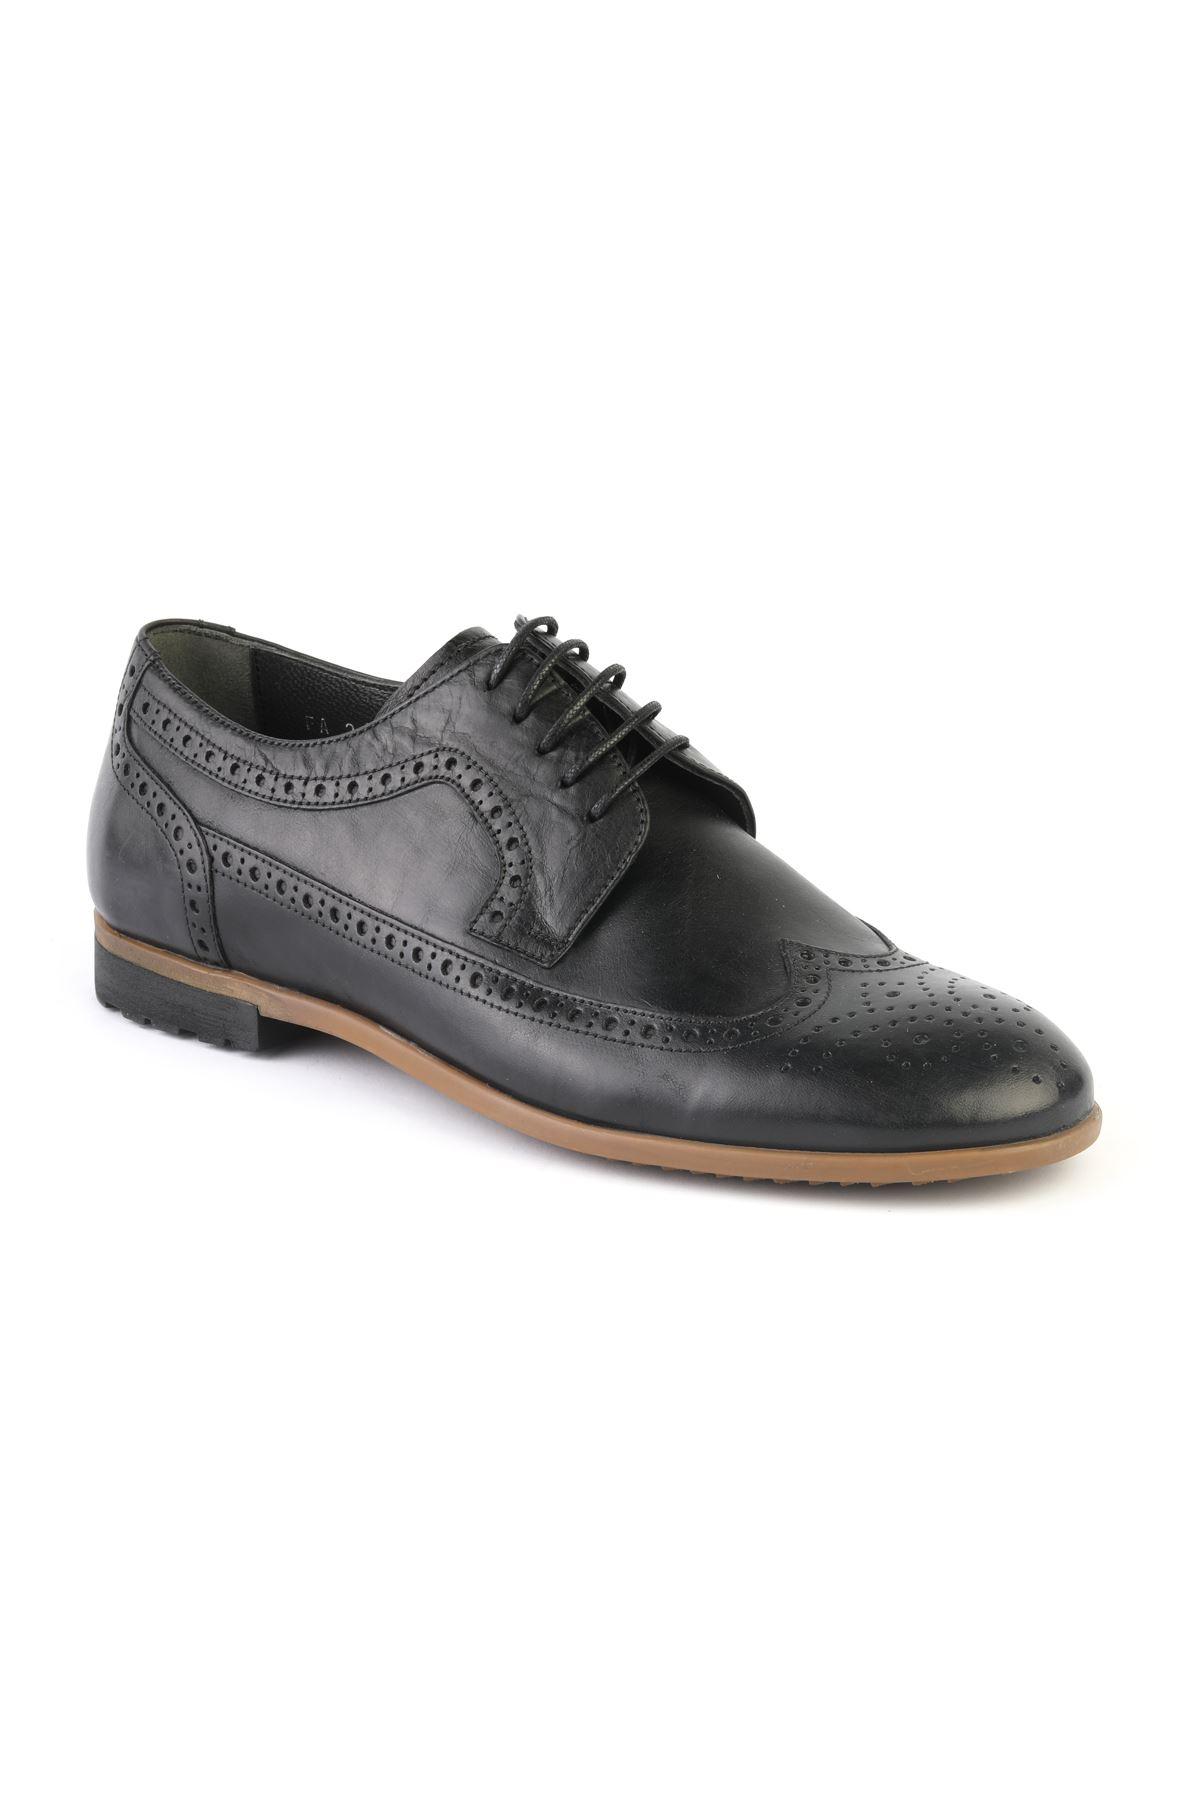 Libero T1128 Black Casual Shoes